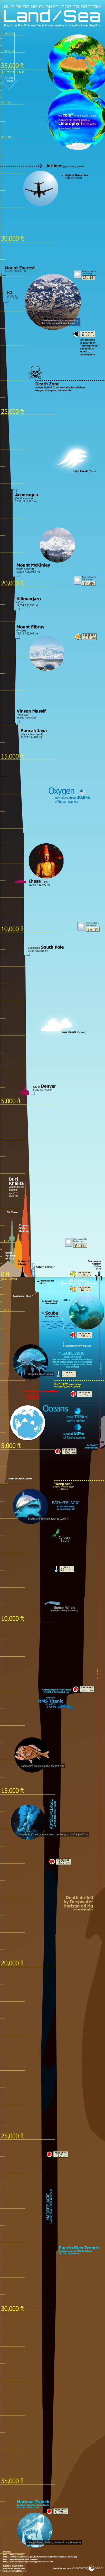 inaltimi-si-adancimi-pe-terra-infografic